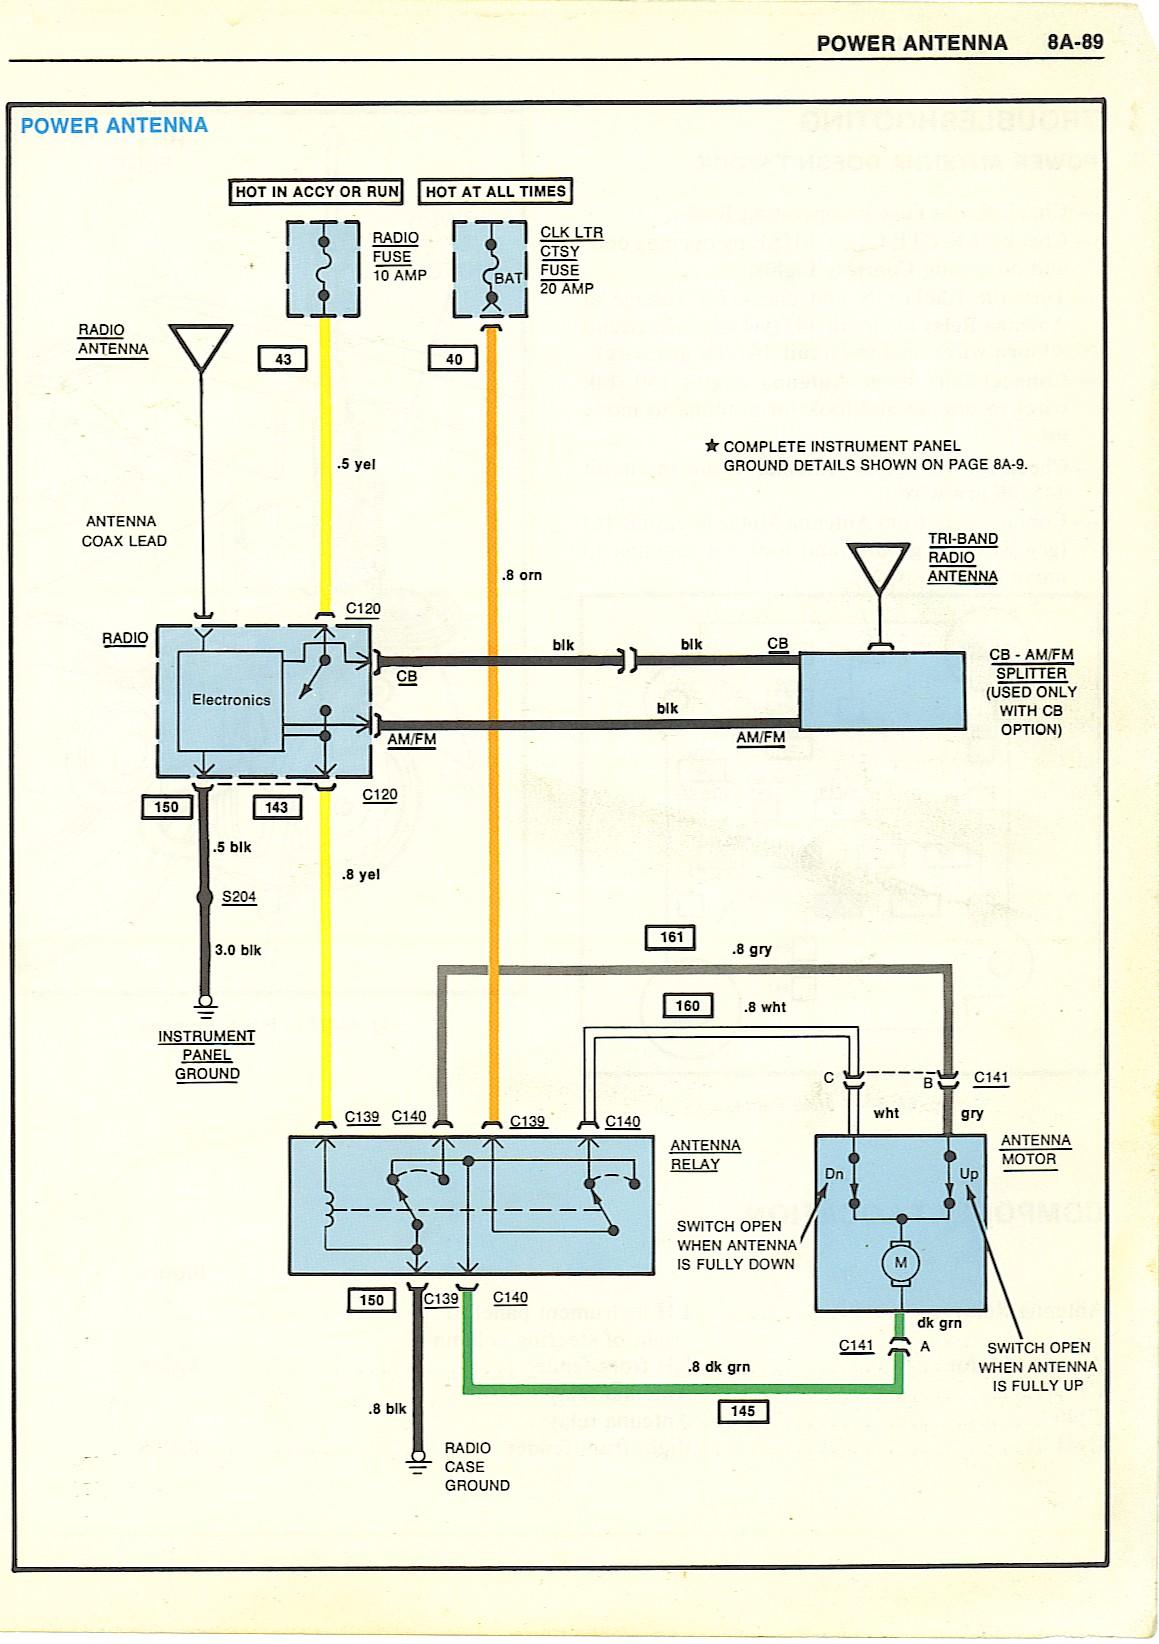 Amazing E46 Antenna Wiring Diagram Get Free Image About Wiring Diagram Wiring Cloud Uslyletkolfr09Org